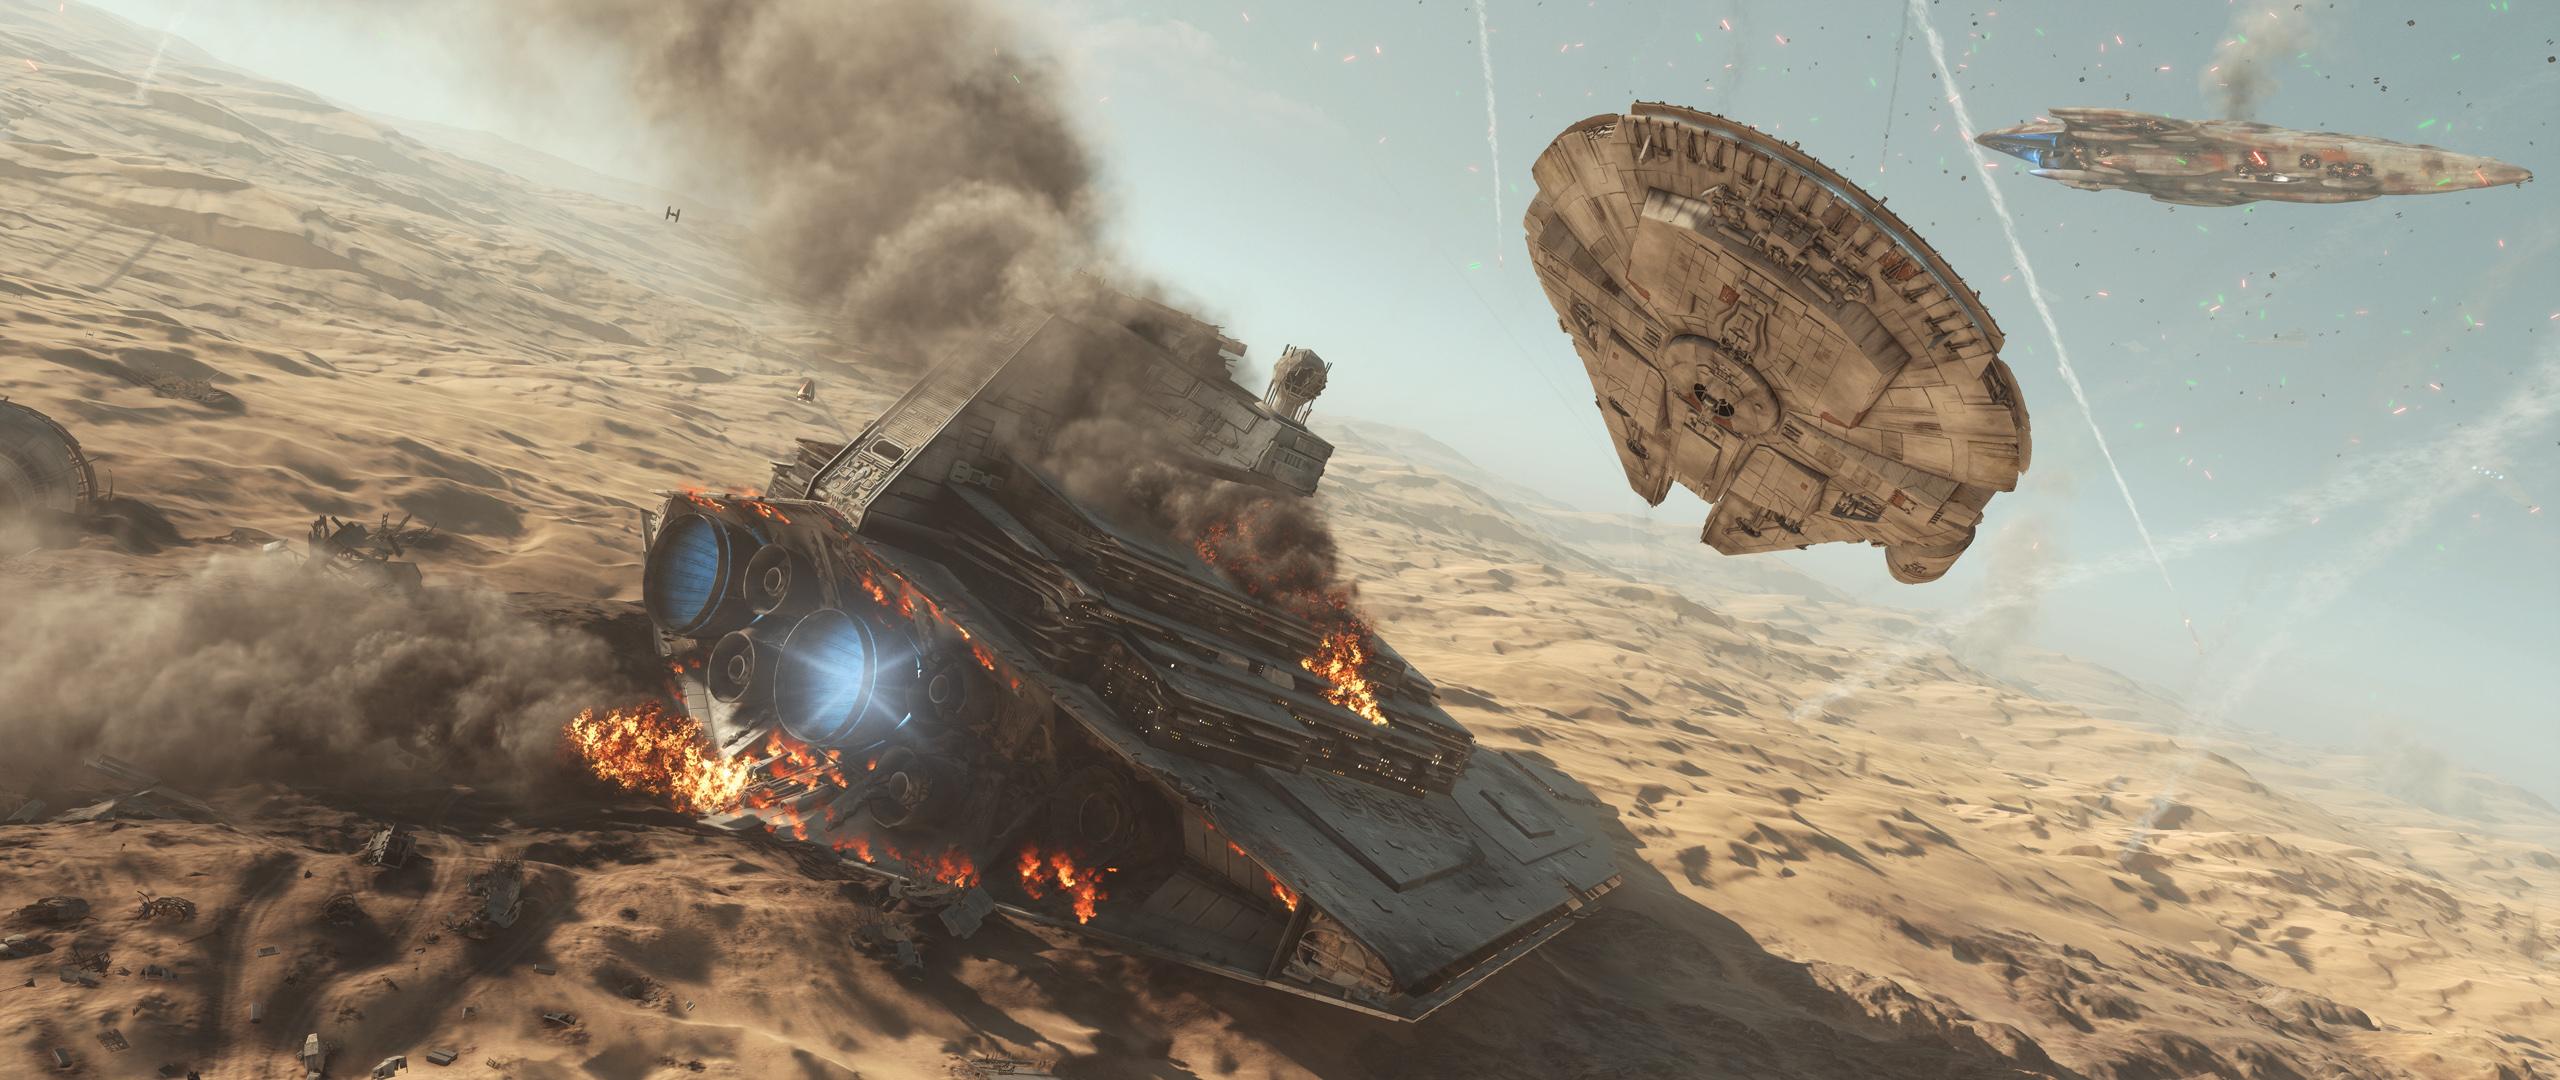 Star Wars Battlefront 2015 Millennium Falcon Wallpaper Resolution 2560x1080 Id 754980 Wallha Com